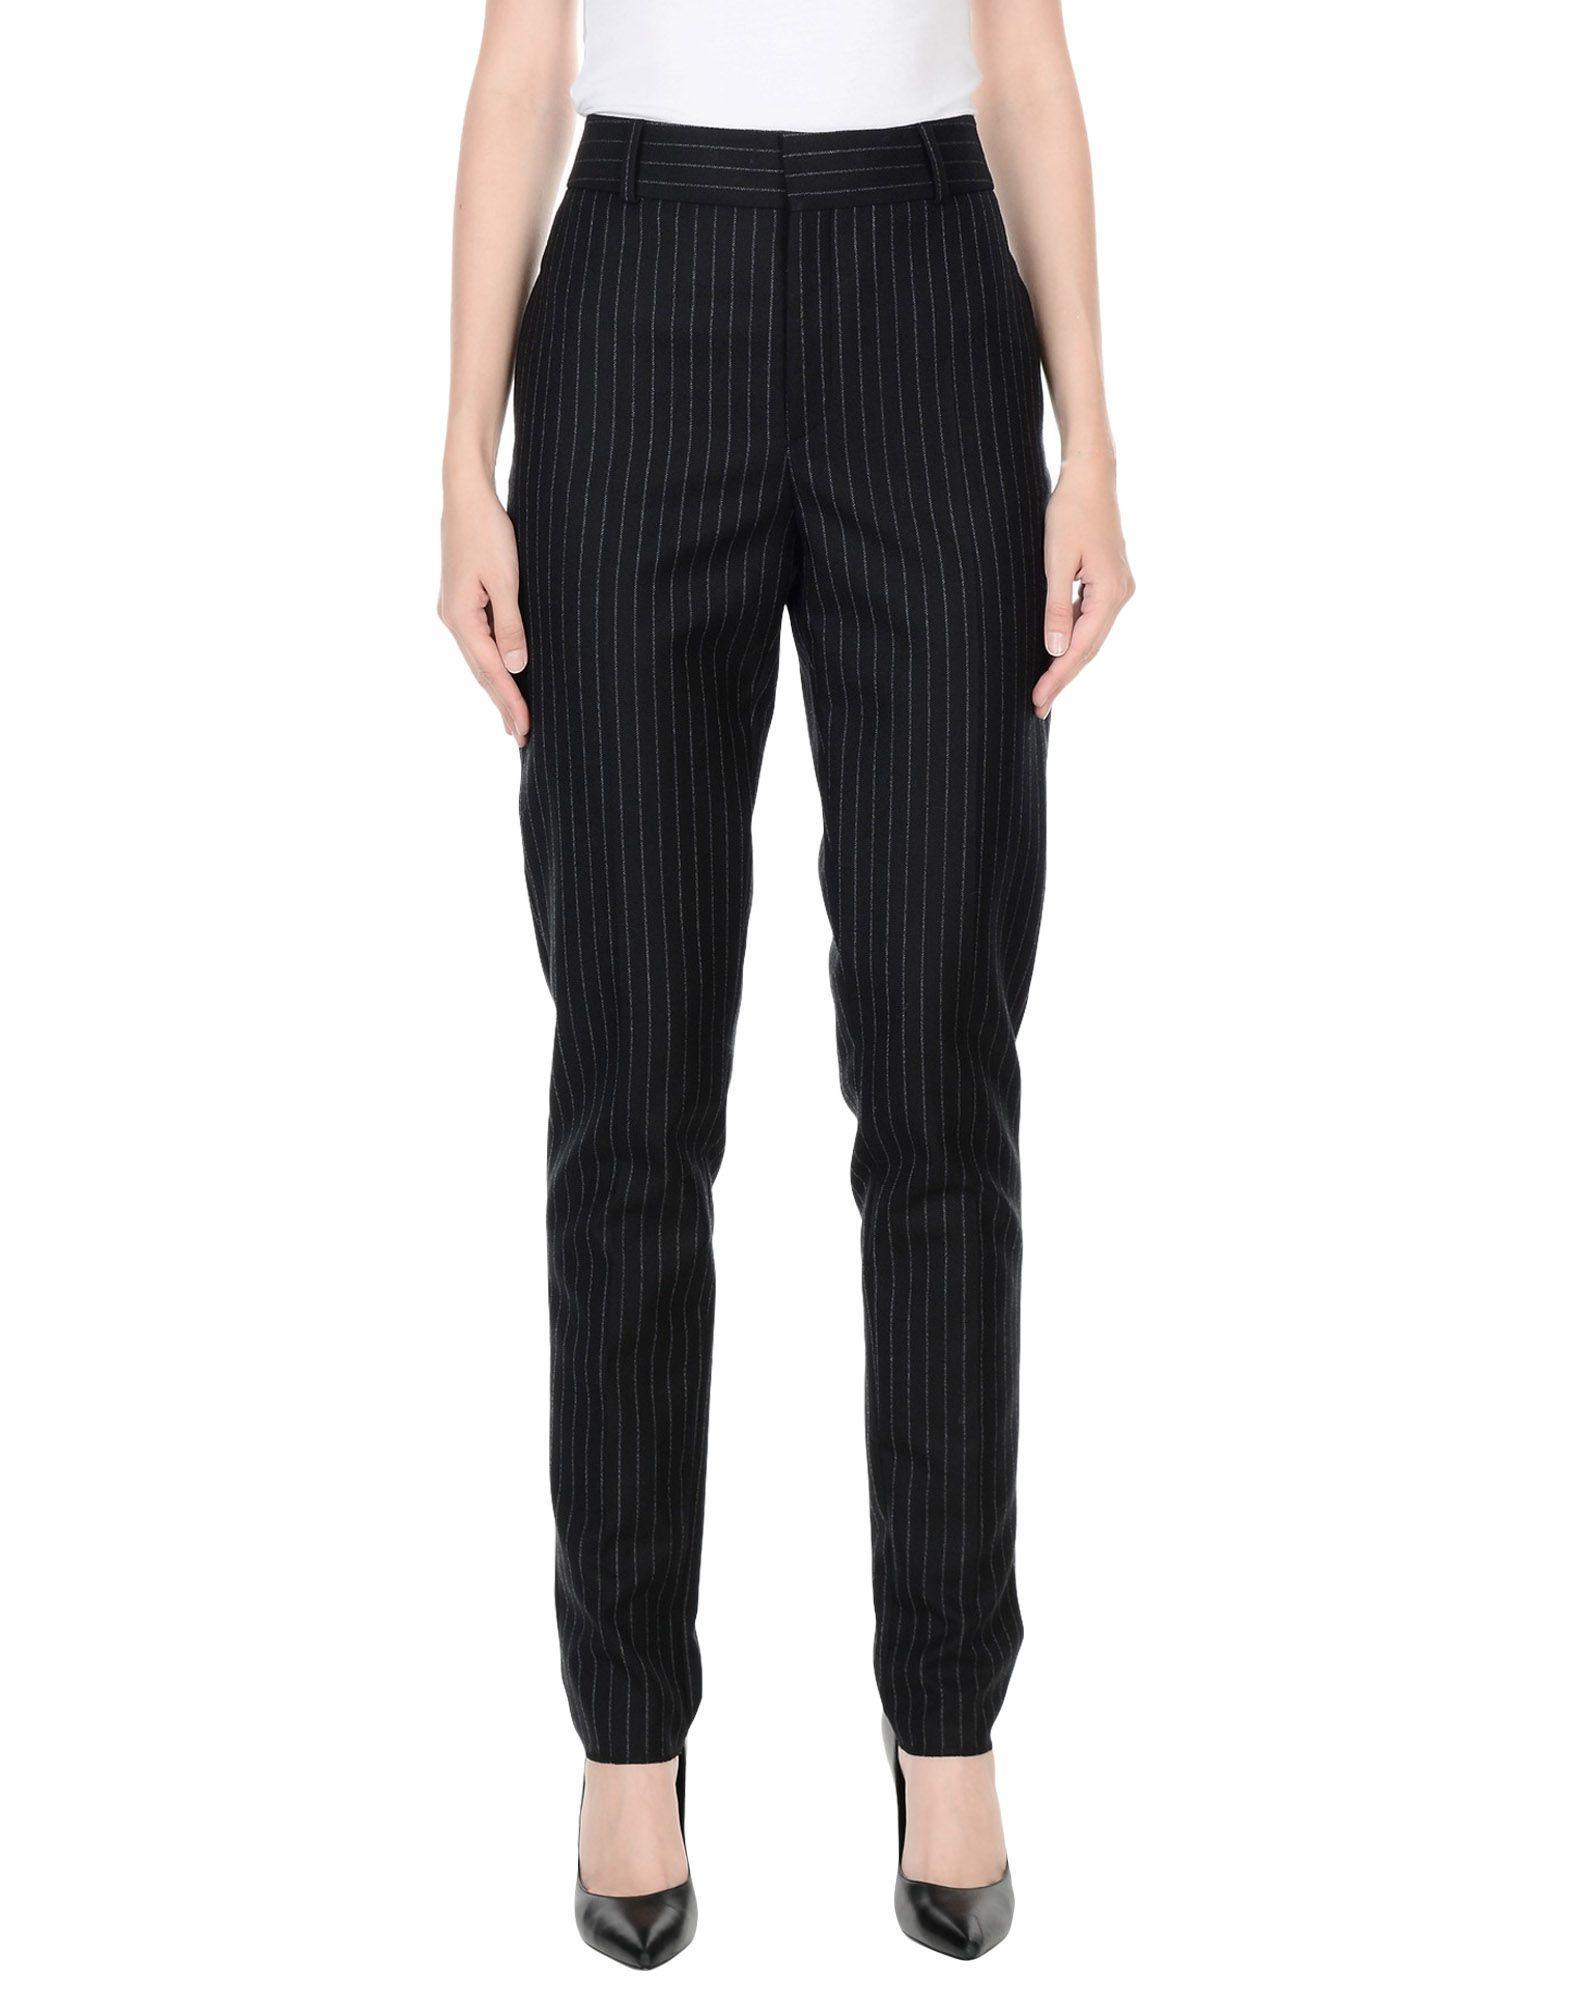 Saint Laurent Black Wool Tailored Trousers